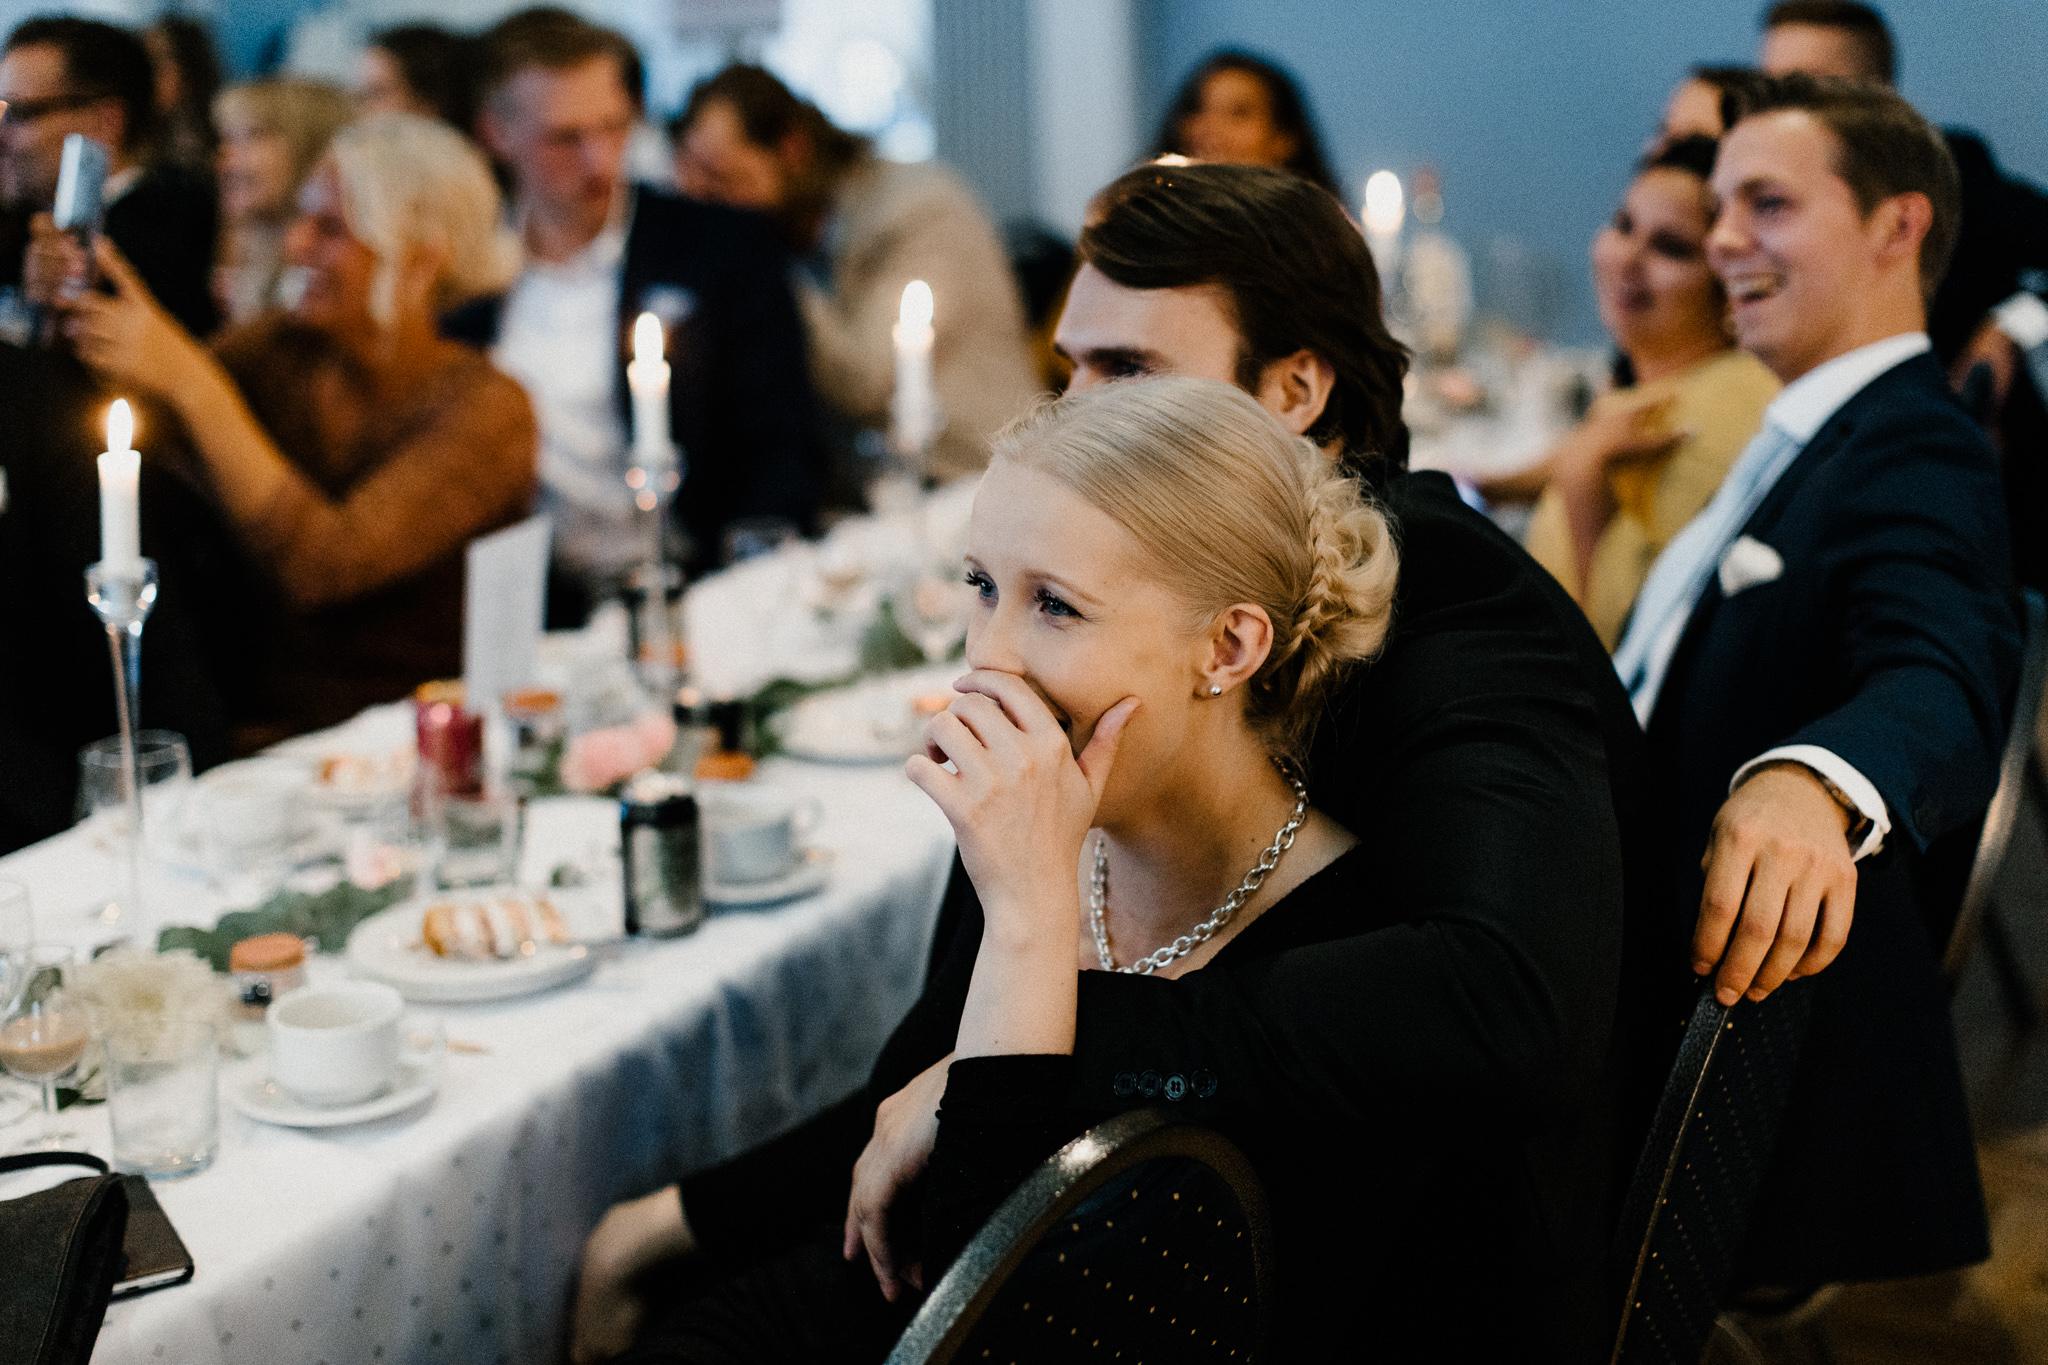 Johanna + Mikko - Tampere - Photo by Patrick Karkkolainen Wedding Photographer-115.jpg